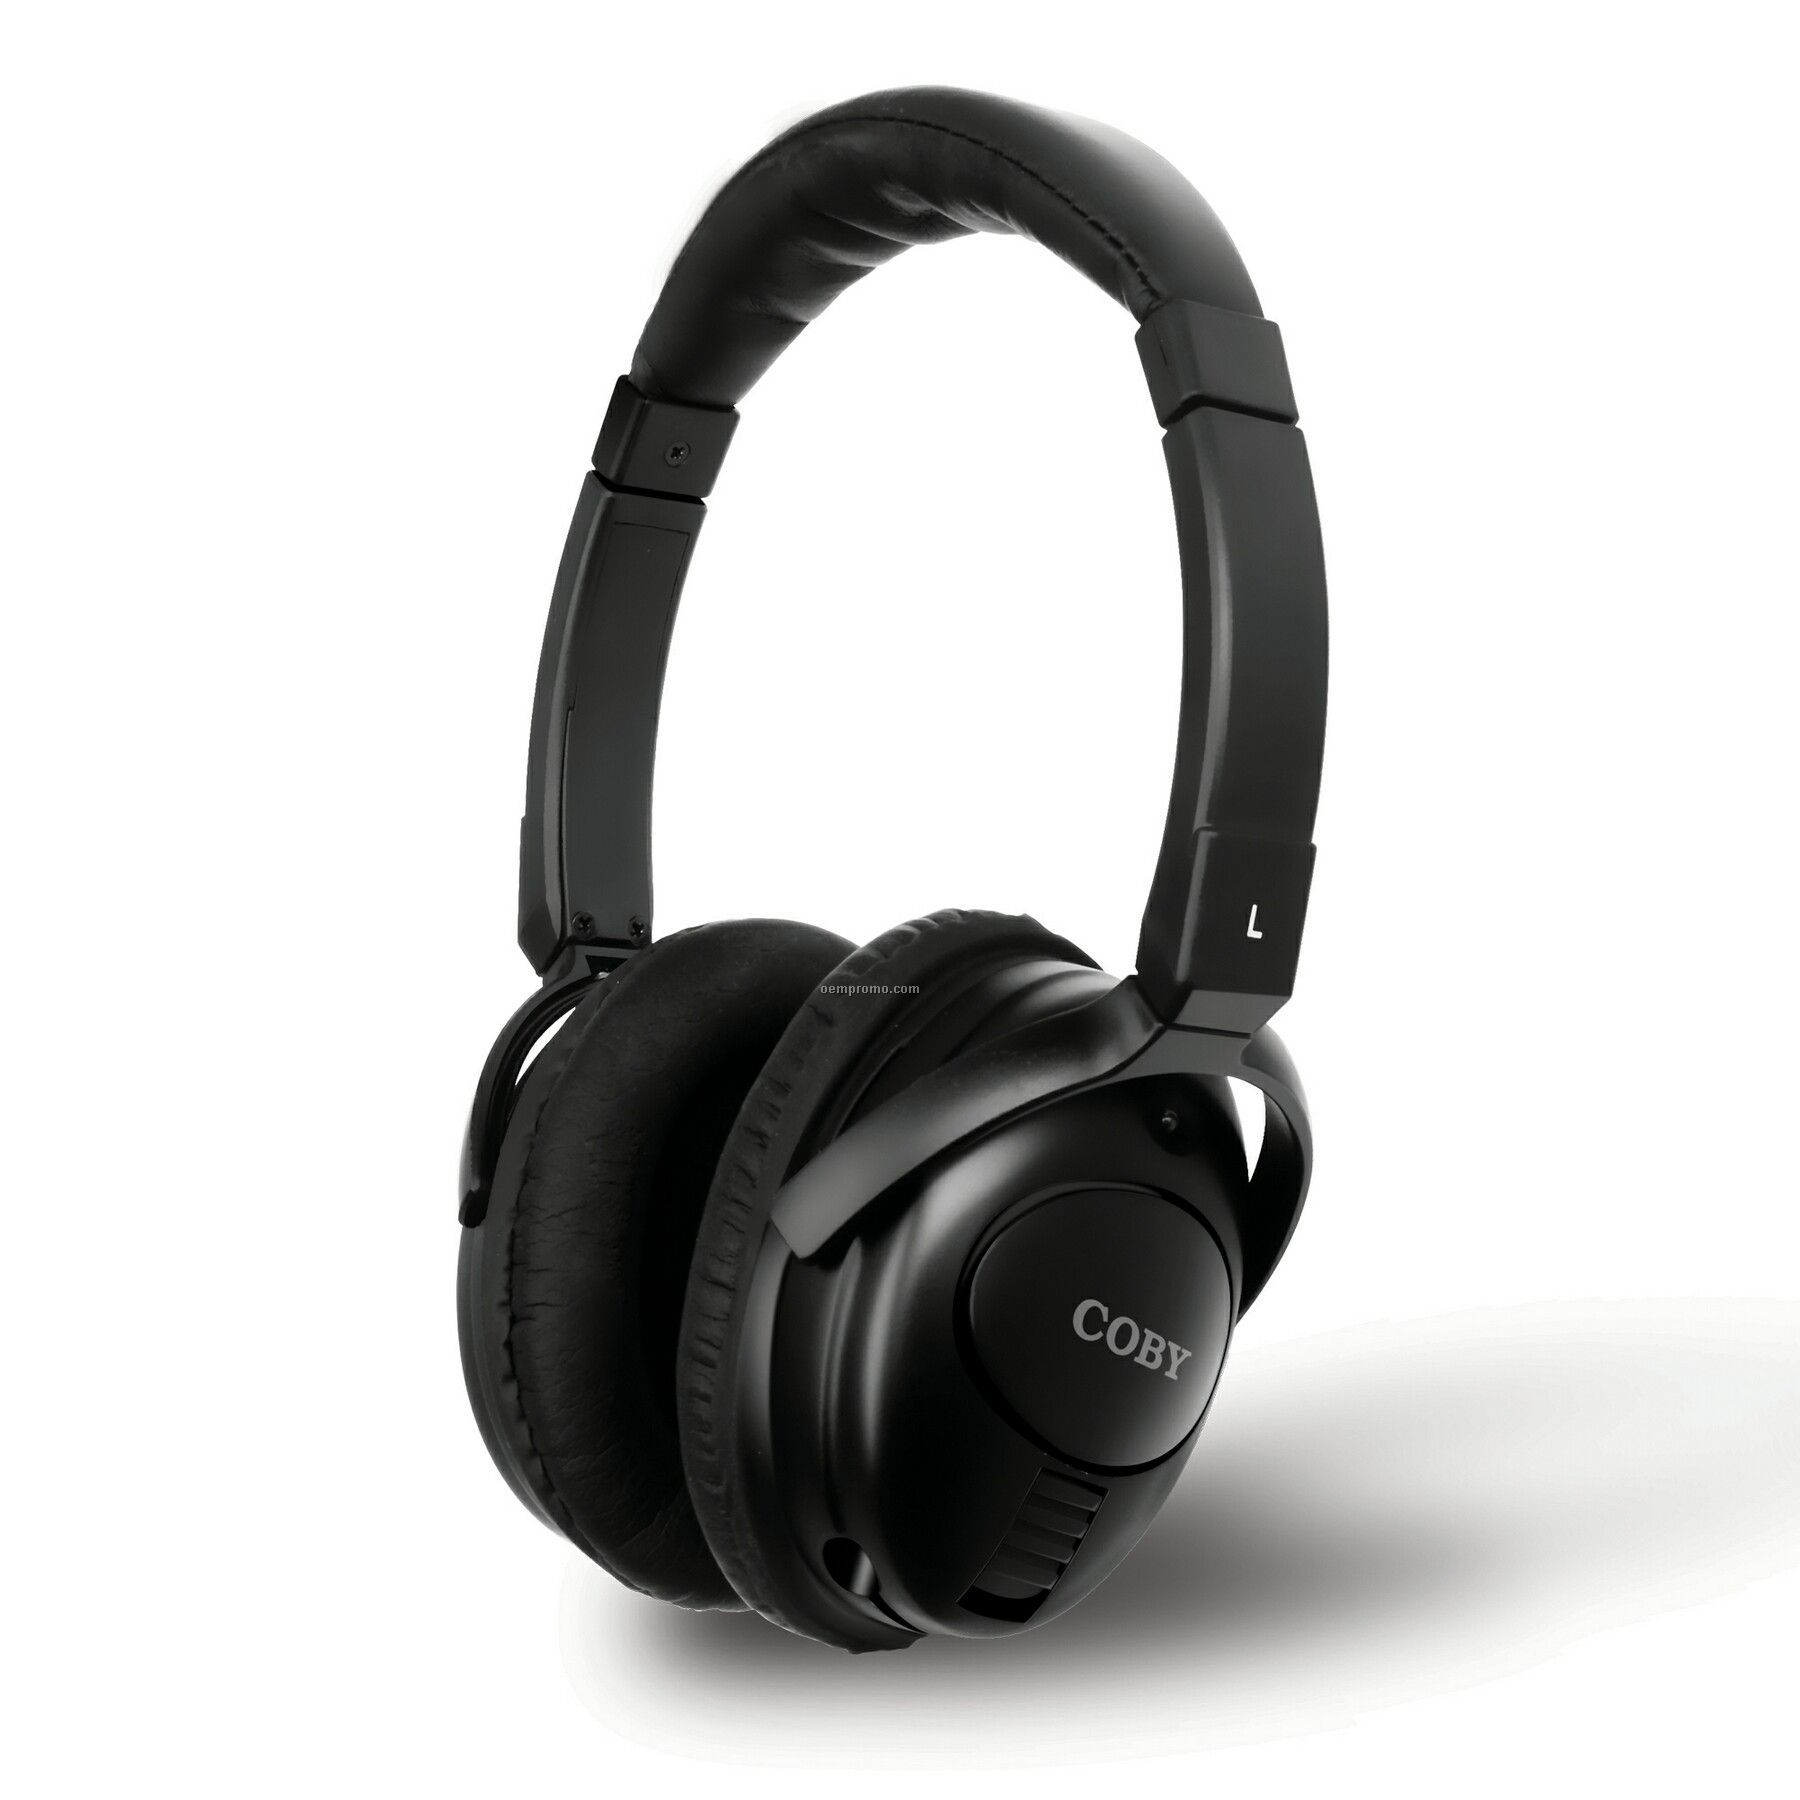 Noise-canceling Stereo Headphones